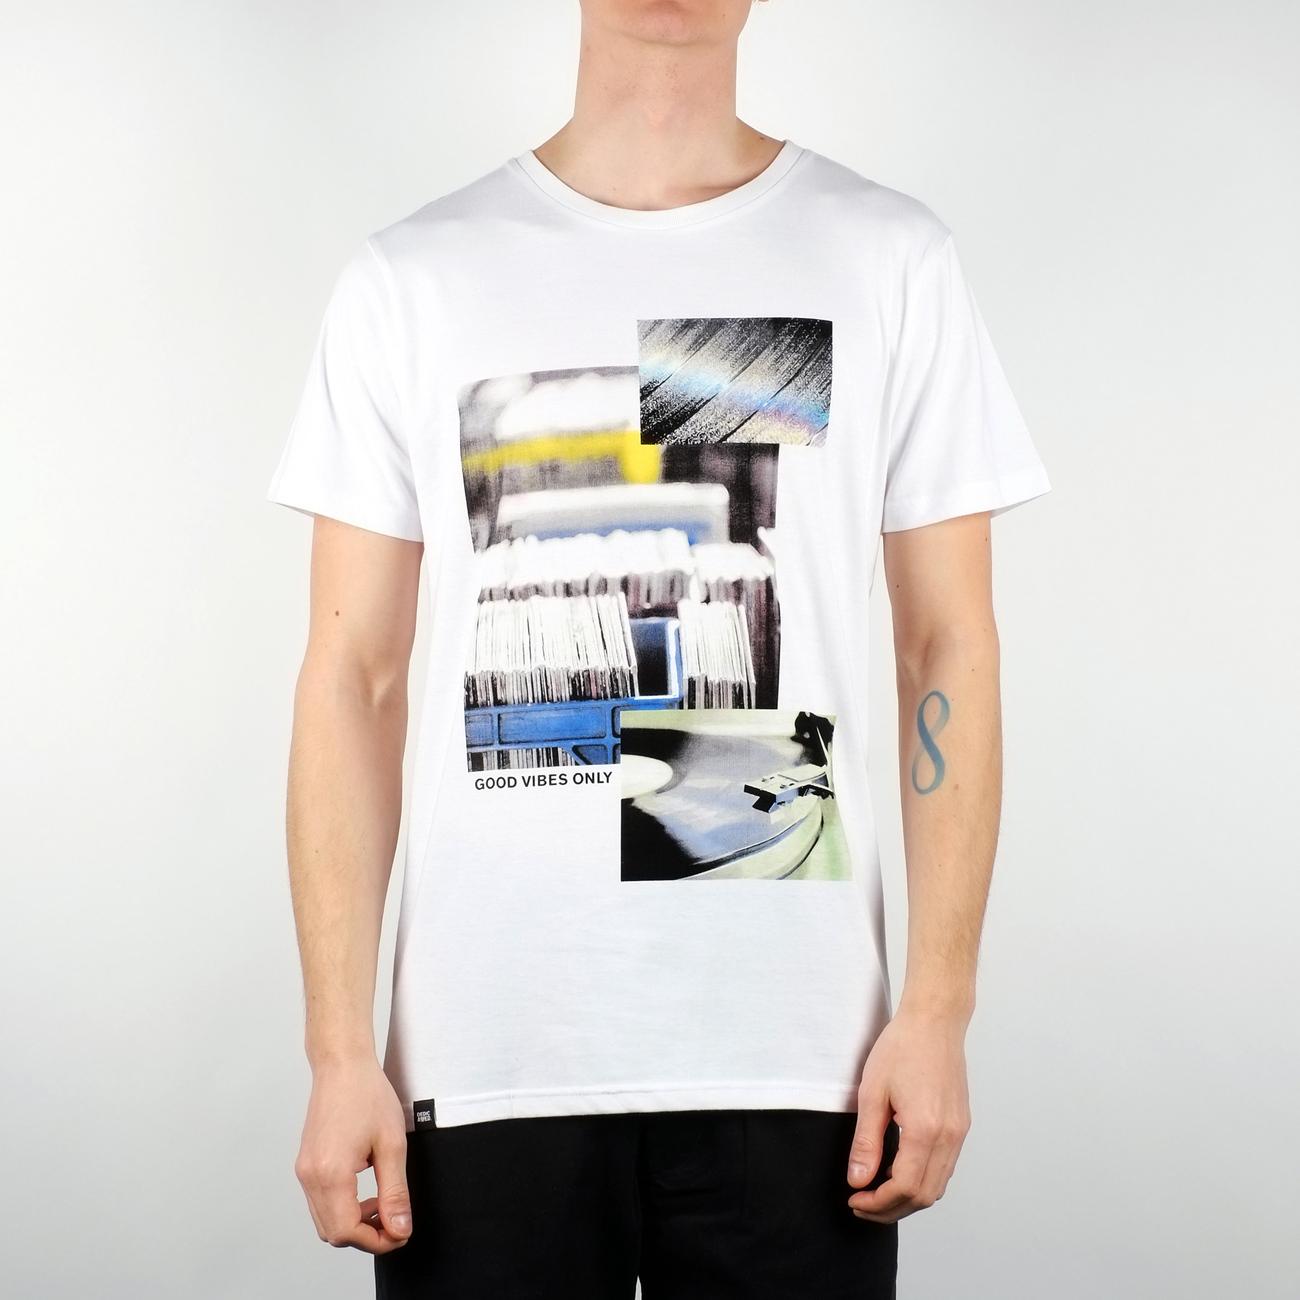 Stockholm T-shirt Vinyl Collage